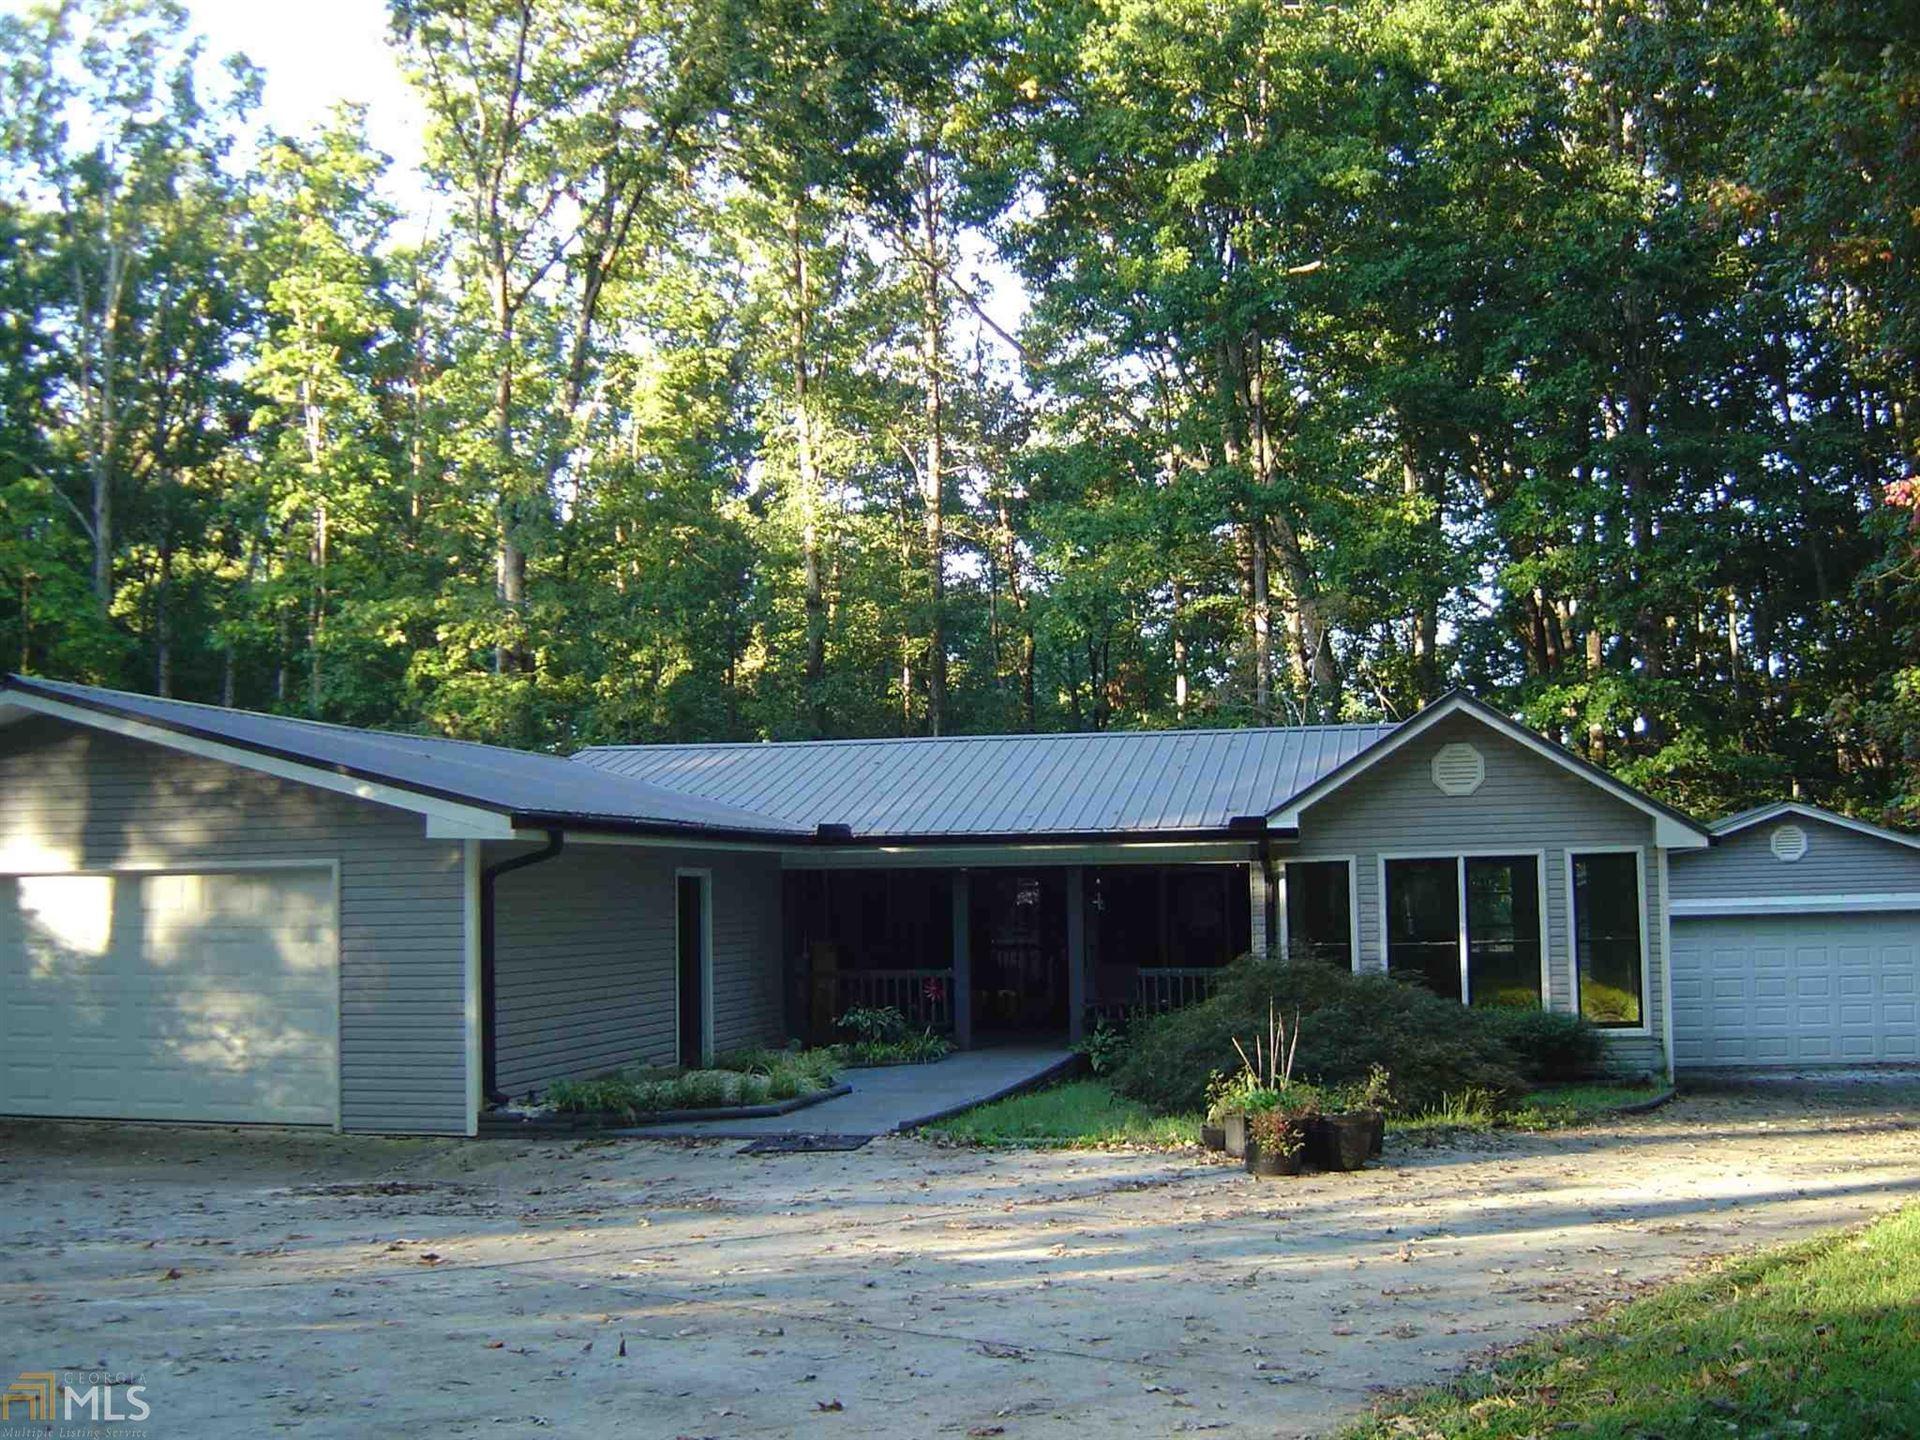 357 Hillshore Rd, Lavonia, GA 30553 - MLS#: 8867995